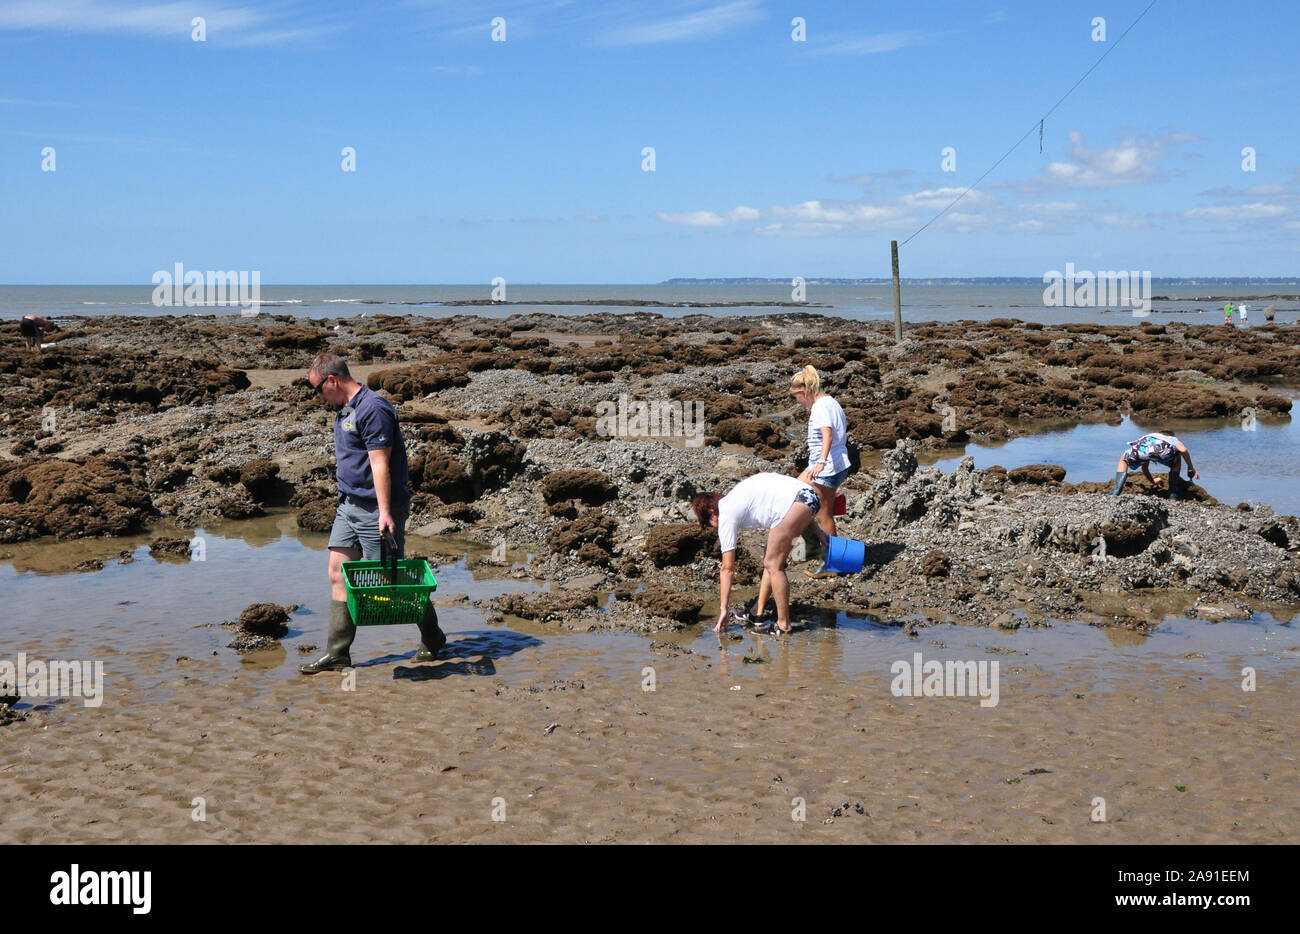 Collecting shellfish,  Loire Atlantique, France Stock Photo